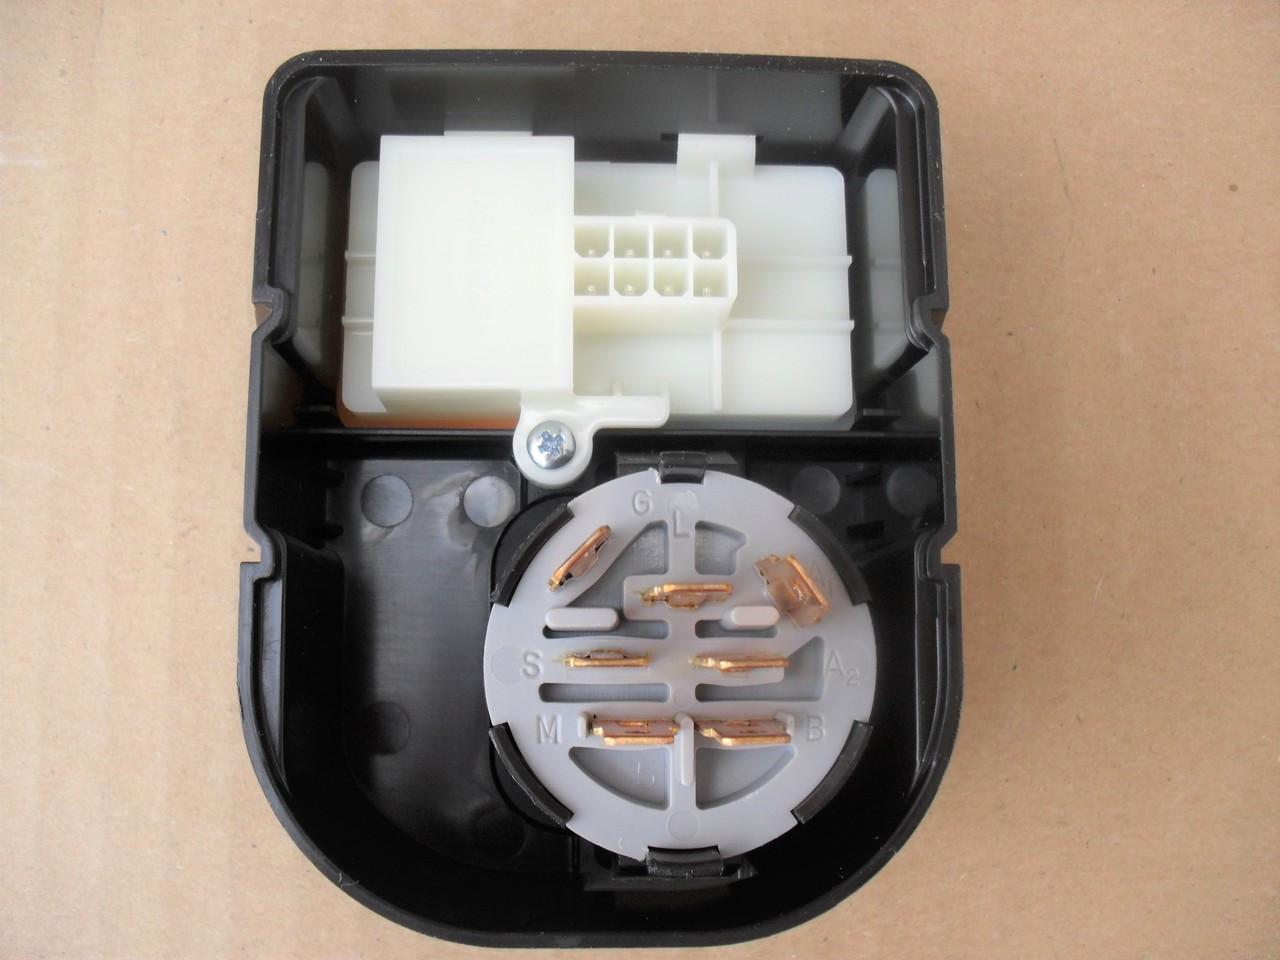 Ignition Starter Switch for Cub Cadet CC30, LTX1040, LTX1042KW, LTX1045,  XT1-LT42, XT1-LT46, XT2-LX42, 725-04227, 725-04227A, 725-04227B,  725-06102A,